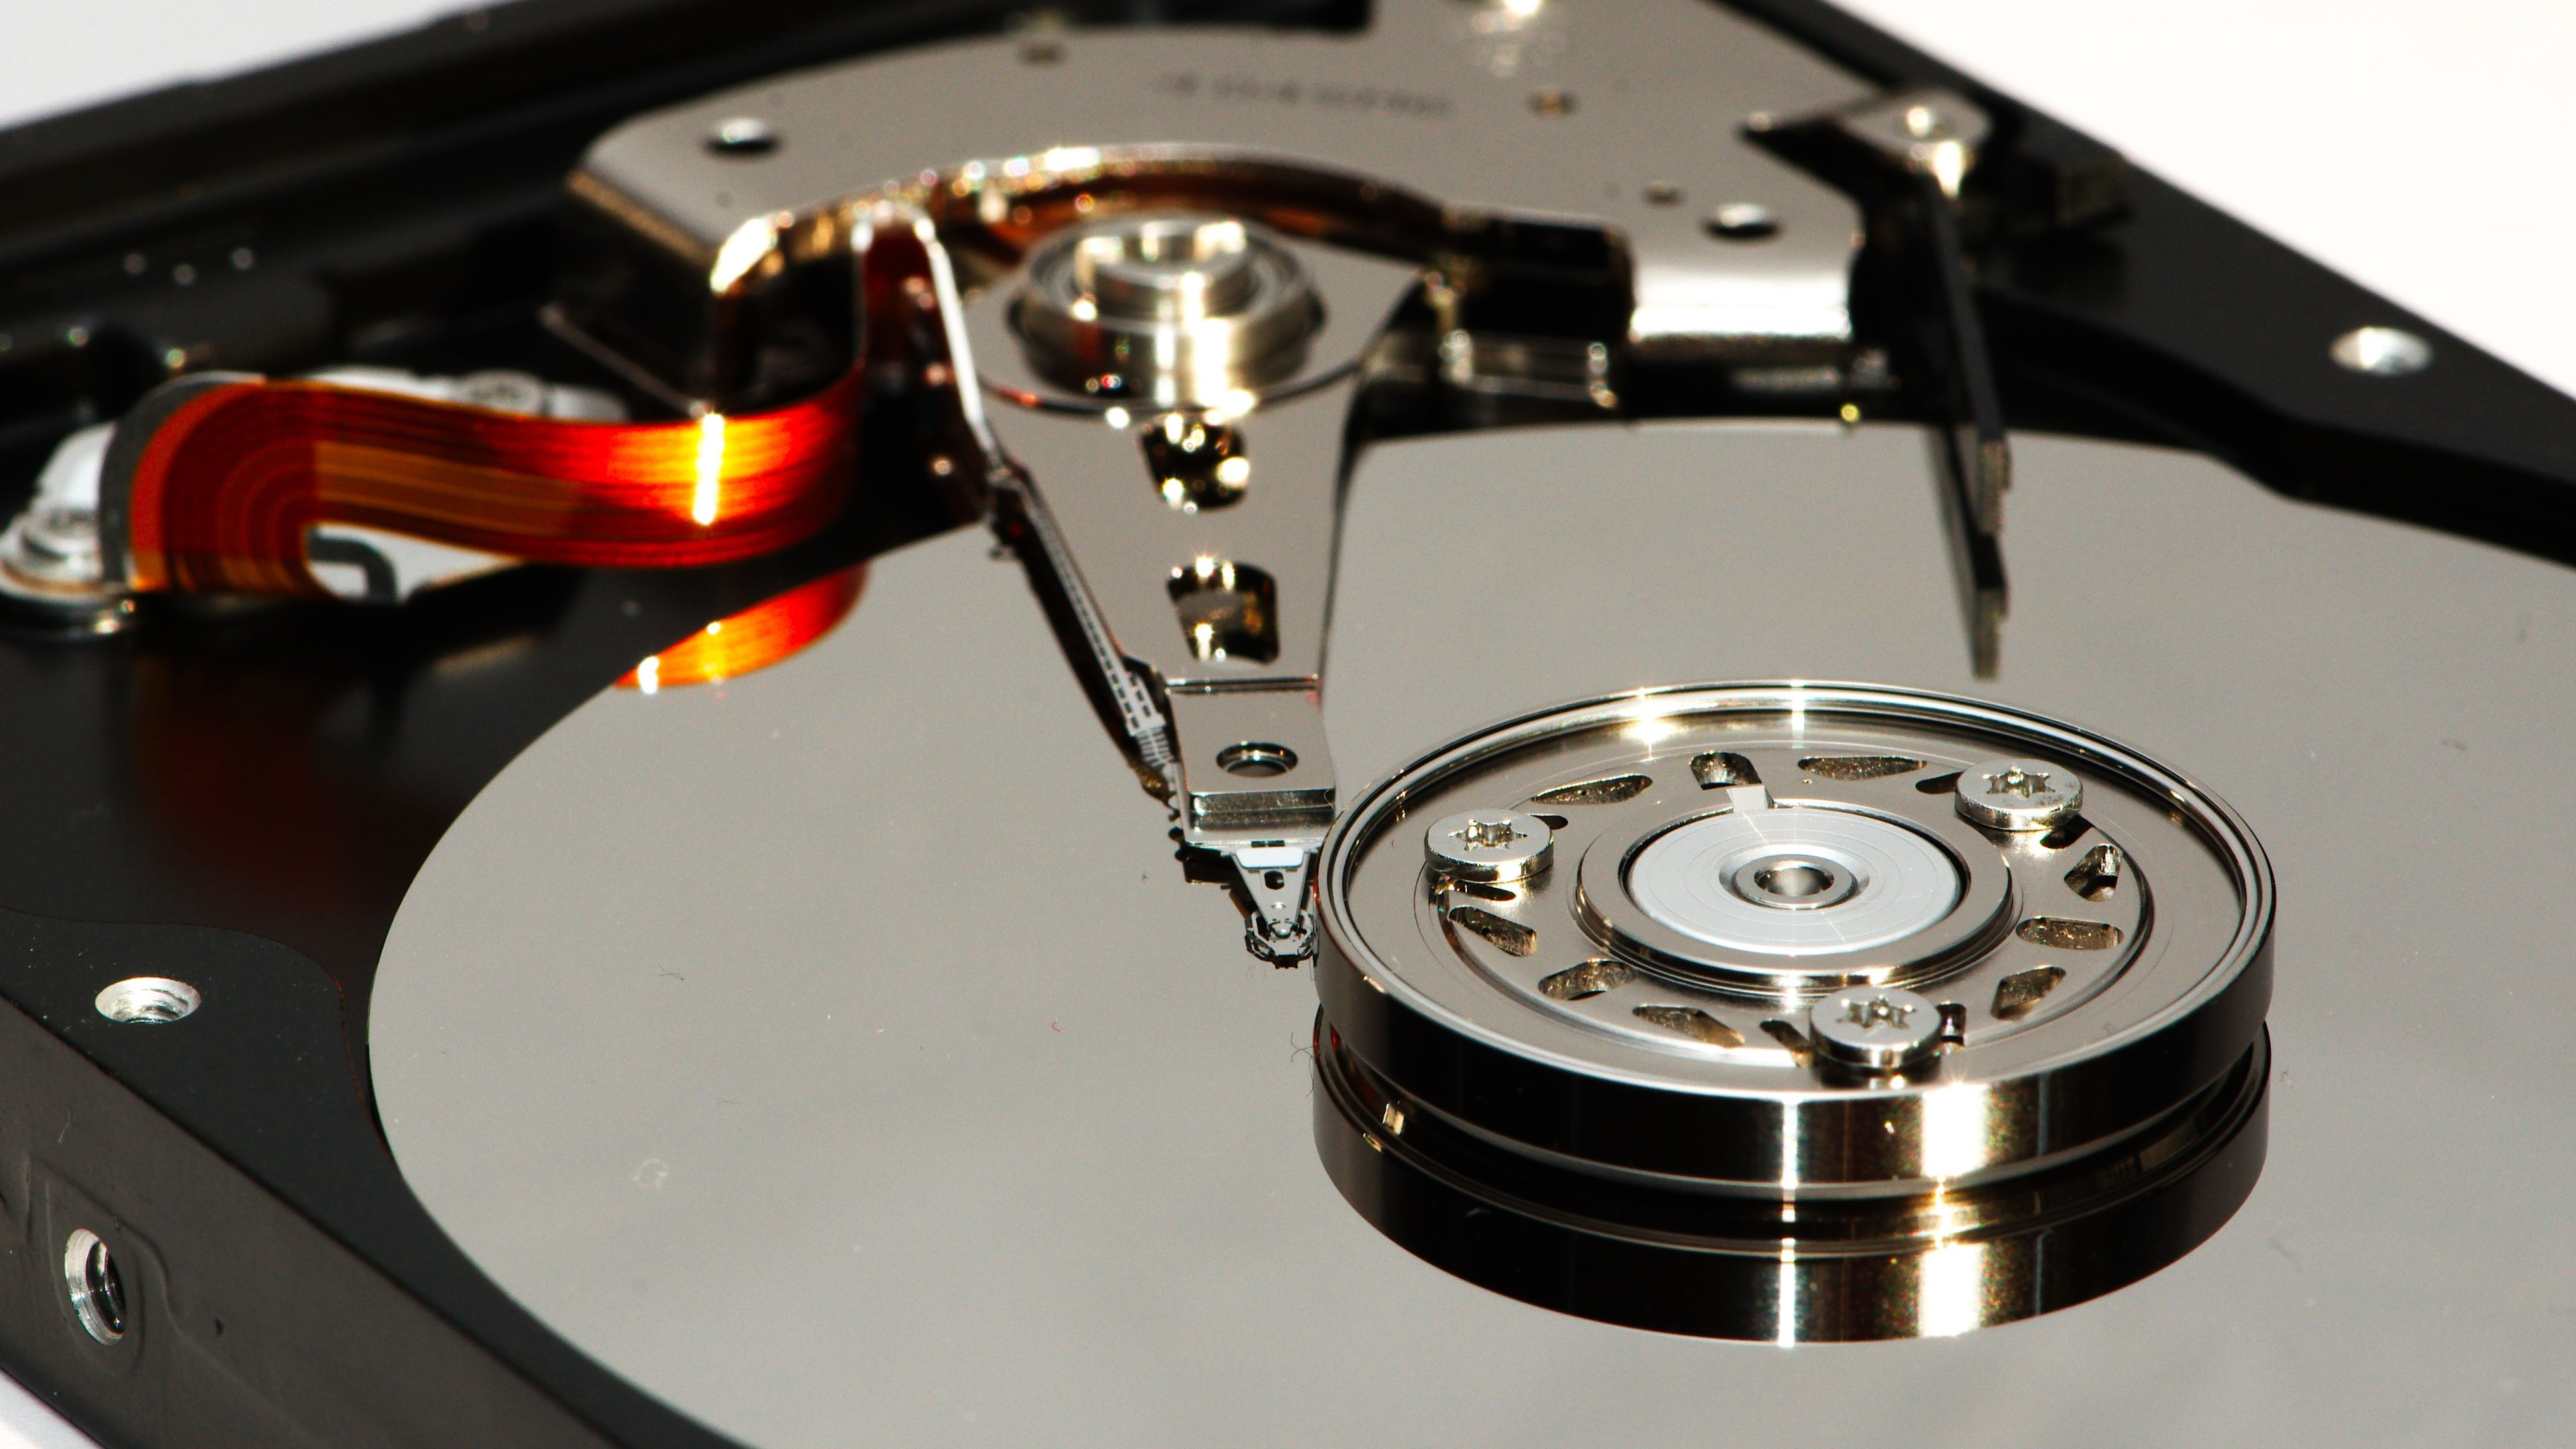 Hard Disk Drive 4k Ultra Fondo De Pantalla Hd Fondo De